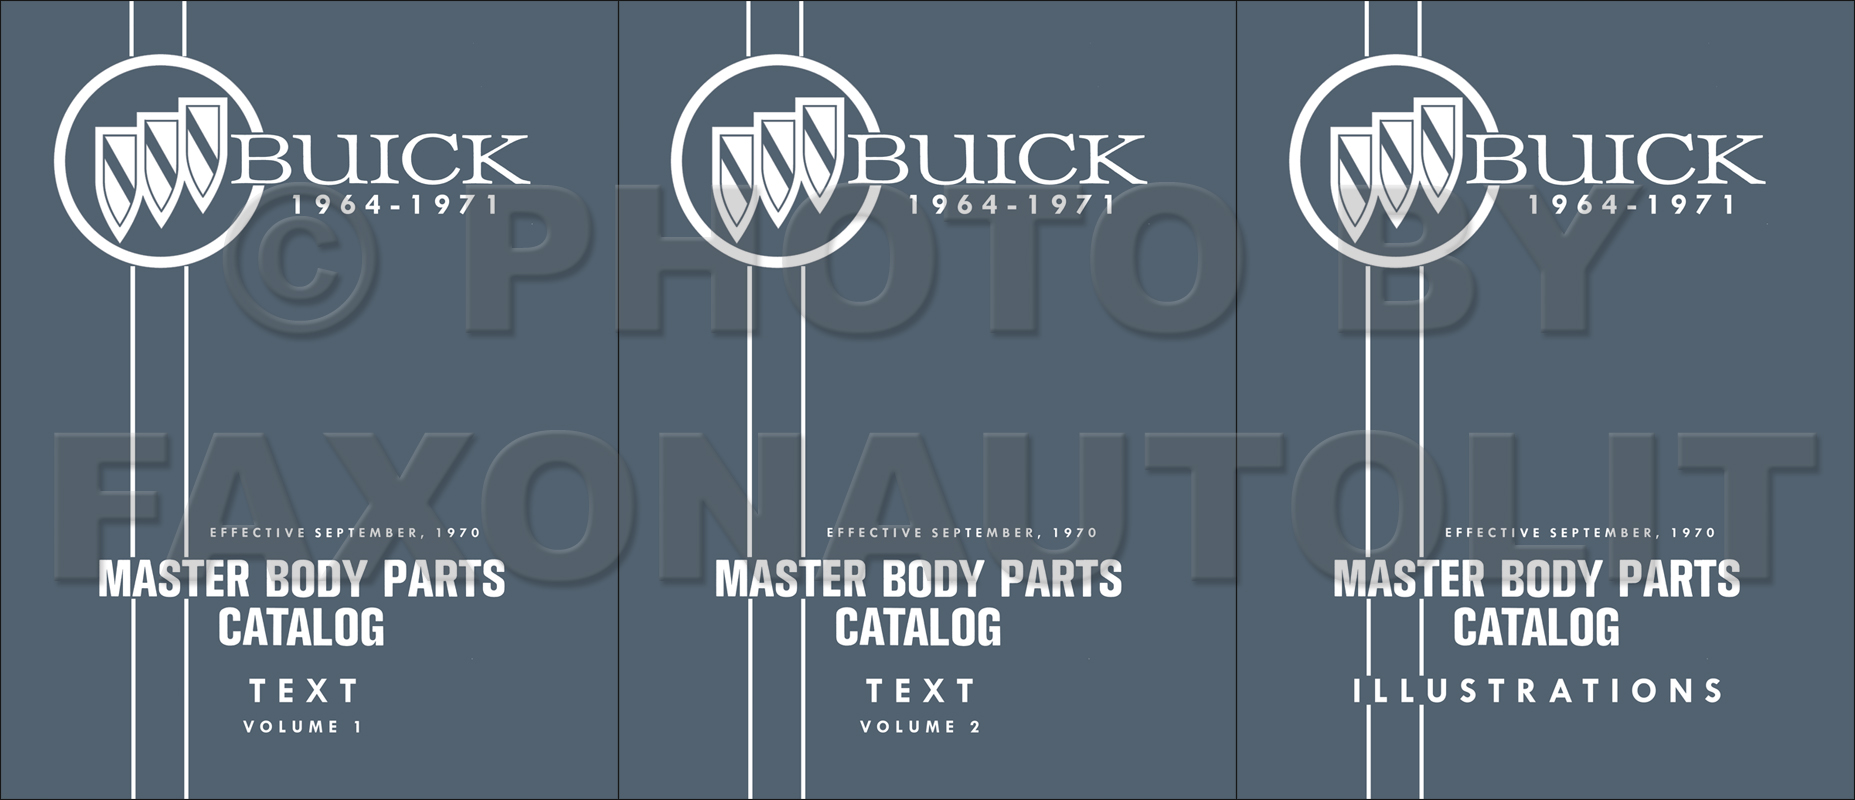 1964 1971 Buick Master Body Parts Book Reprint All Models 3 Volume Set 1968 1969 70 71 72 Skylark Gs Gsx Electra Lesabre Wiring